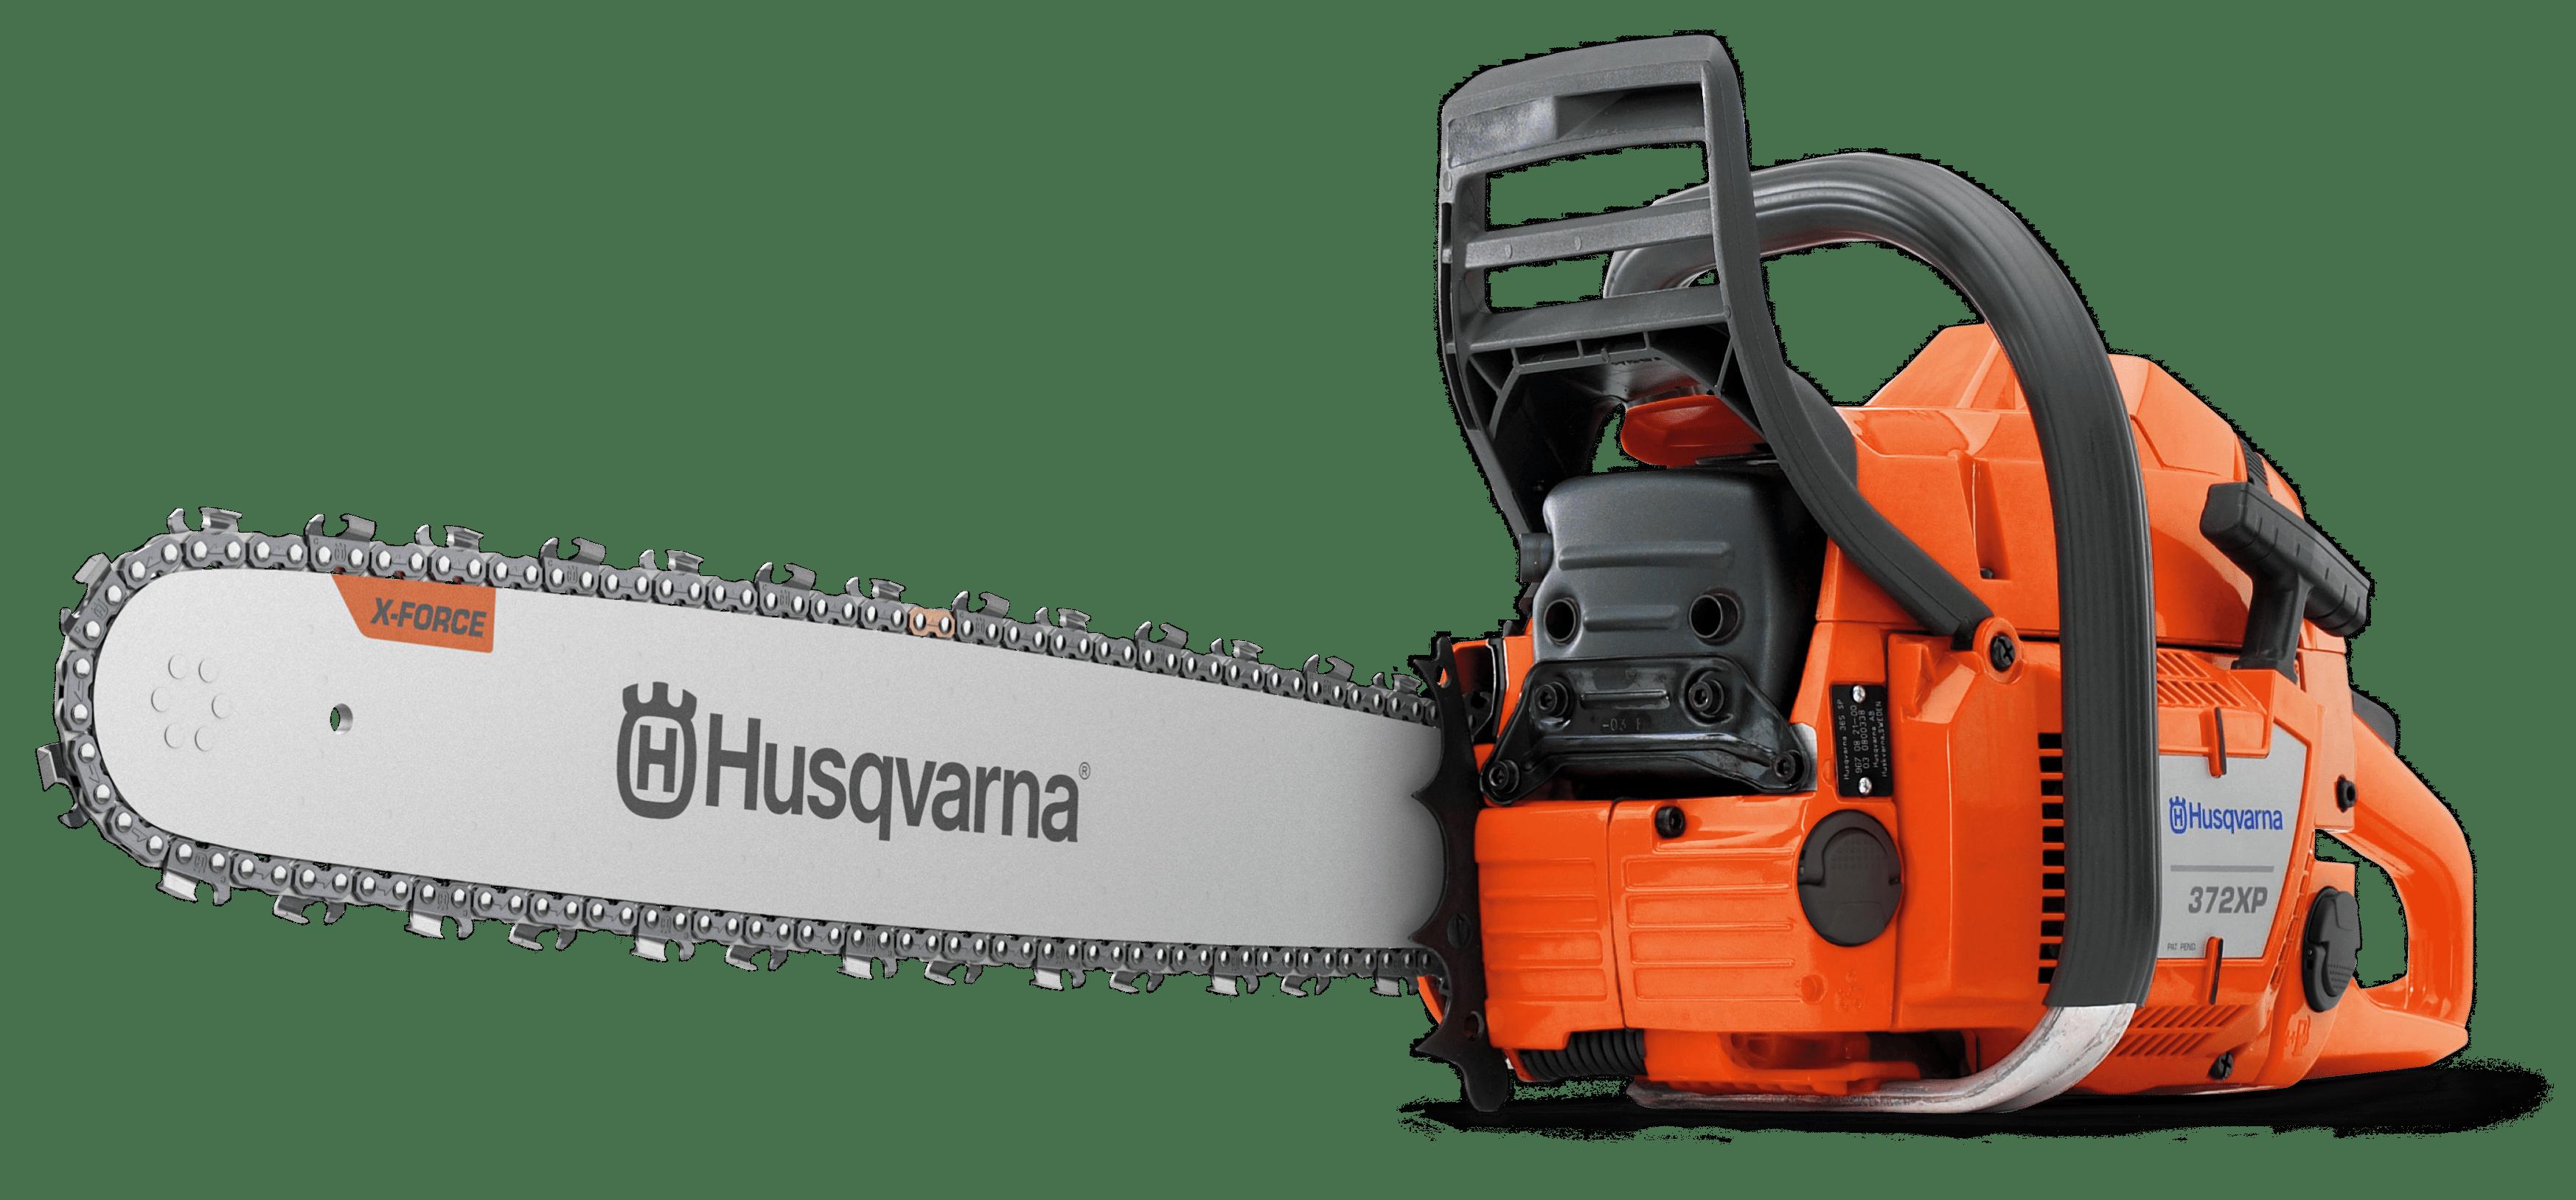 Tanque de gasolina adecuado Husqvarna 346xp xpg nuevo motor sierra motosierra